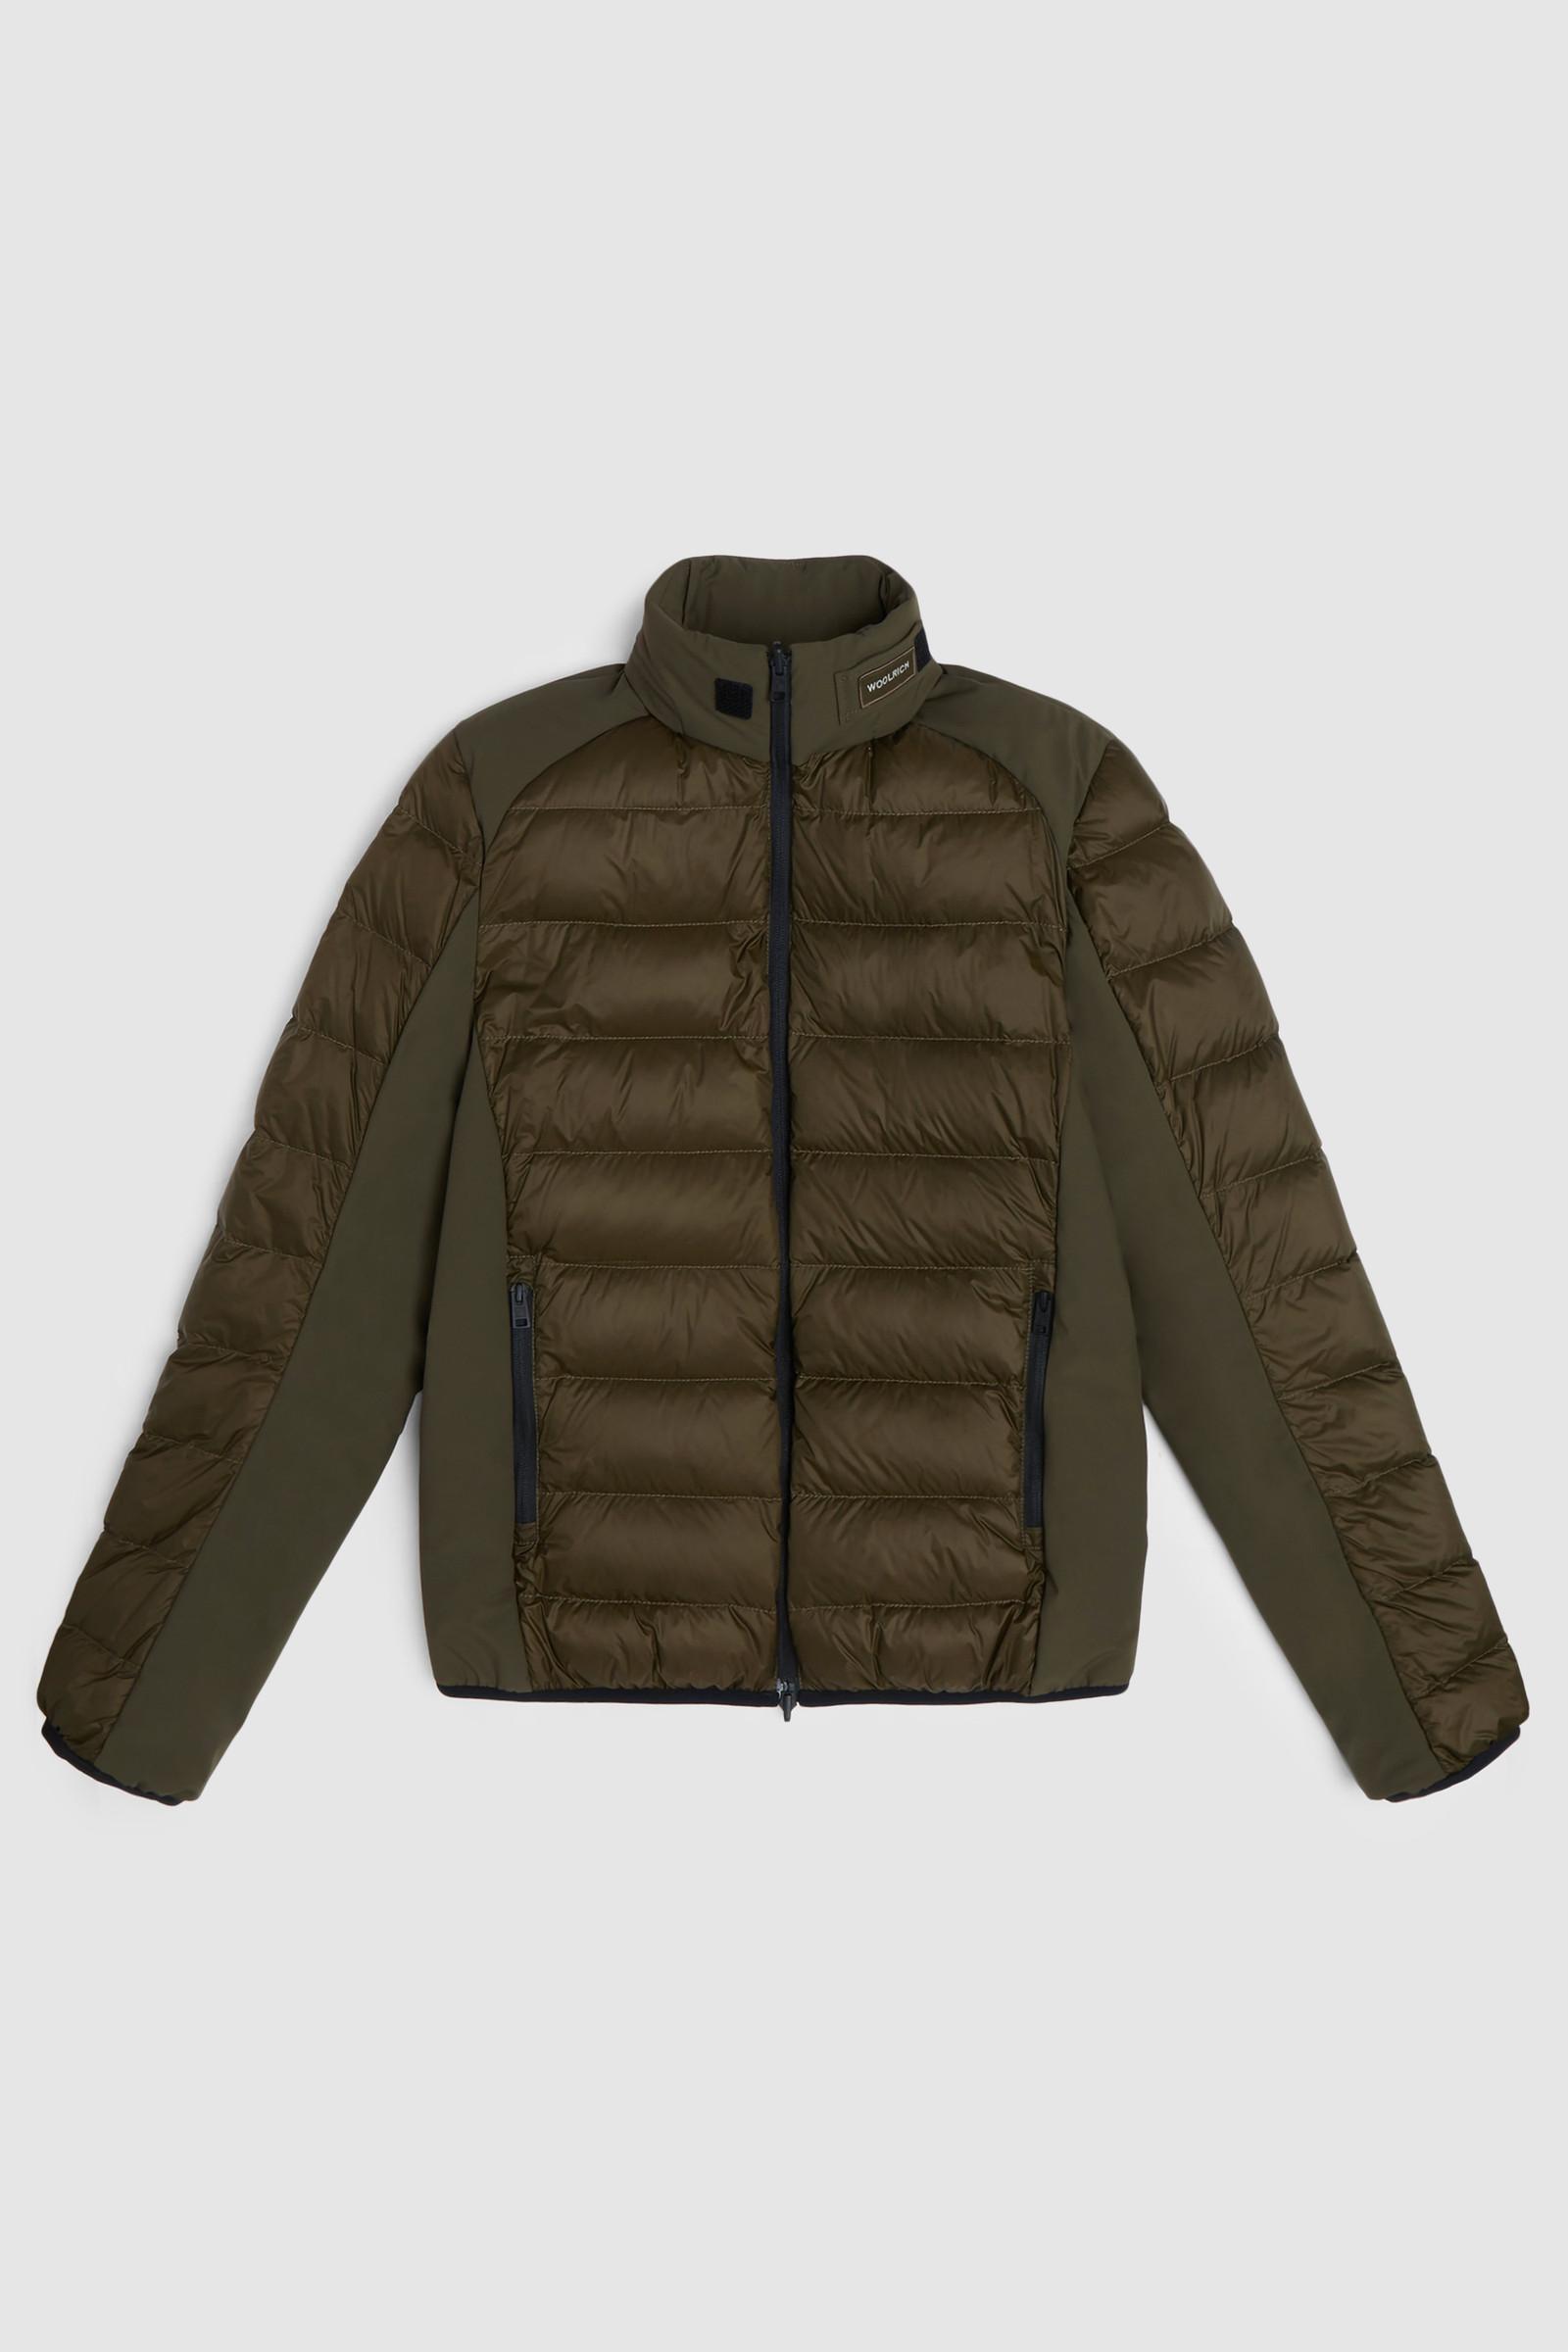 Tech Graphene Jacket